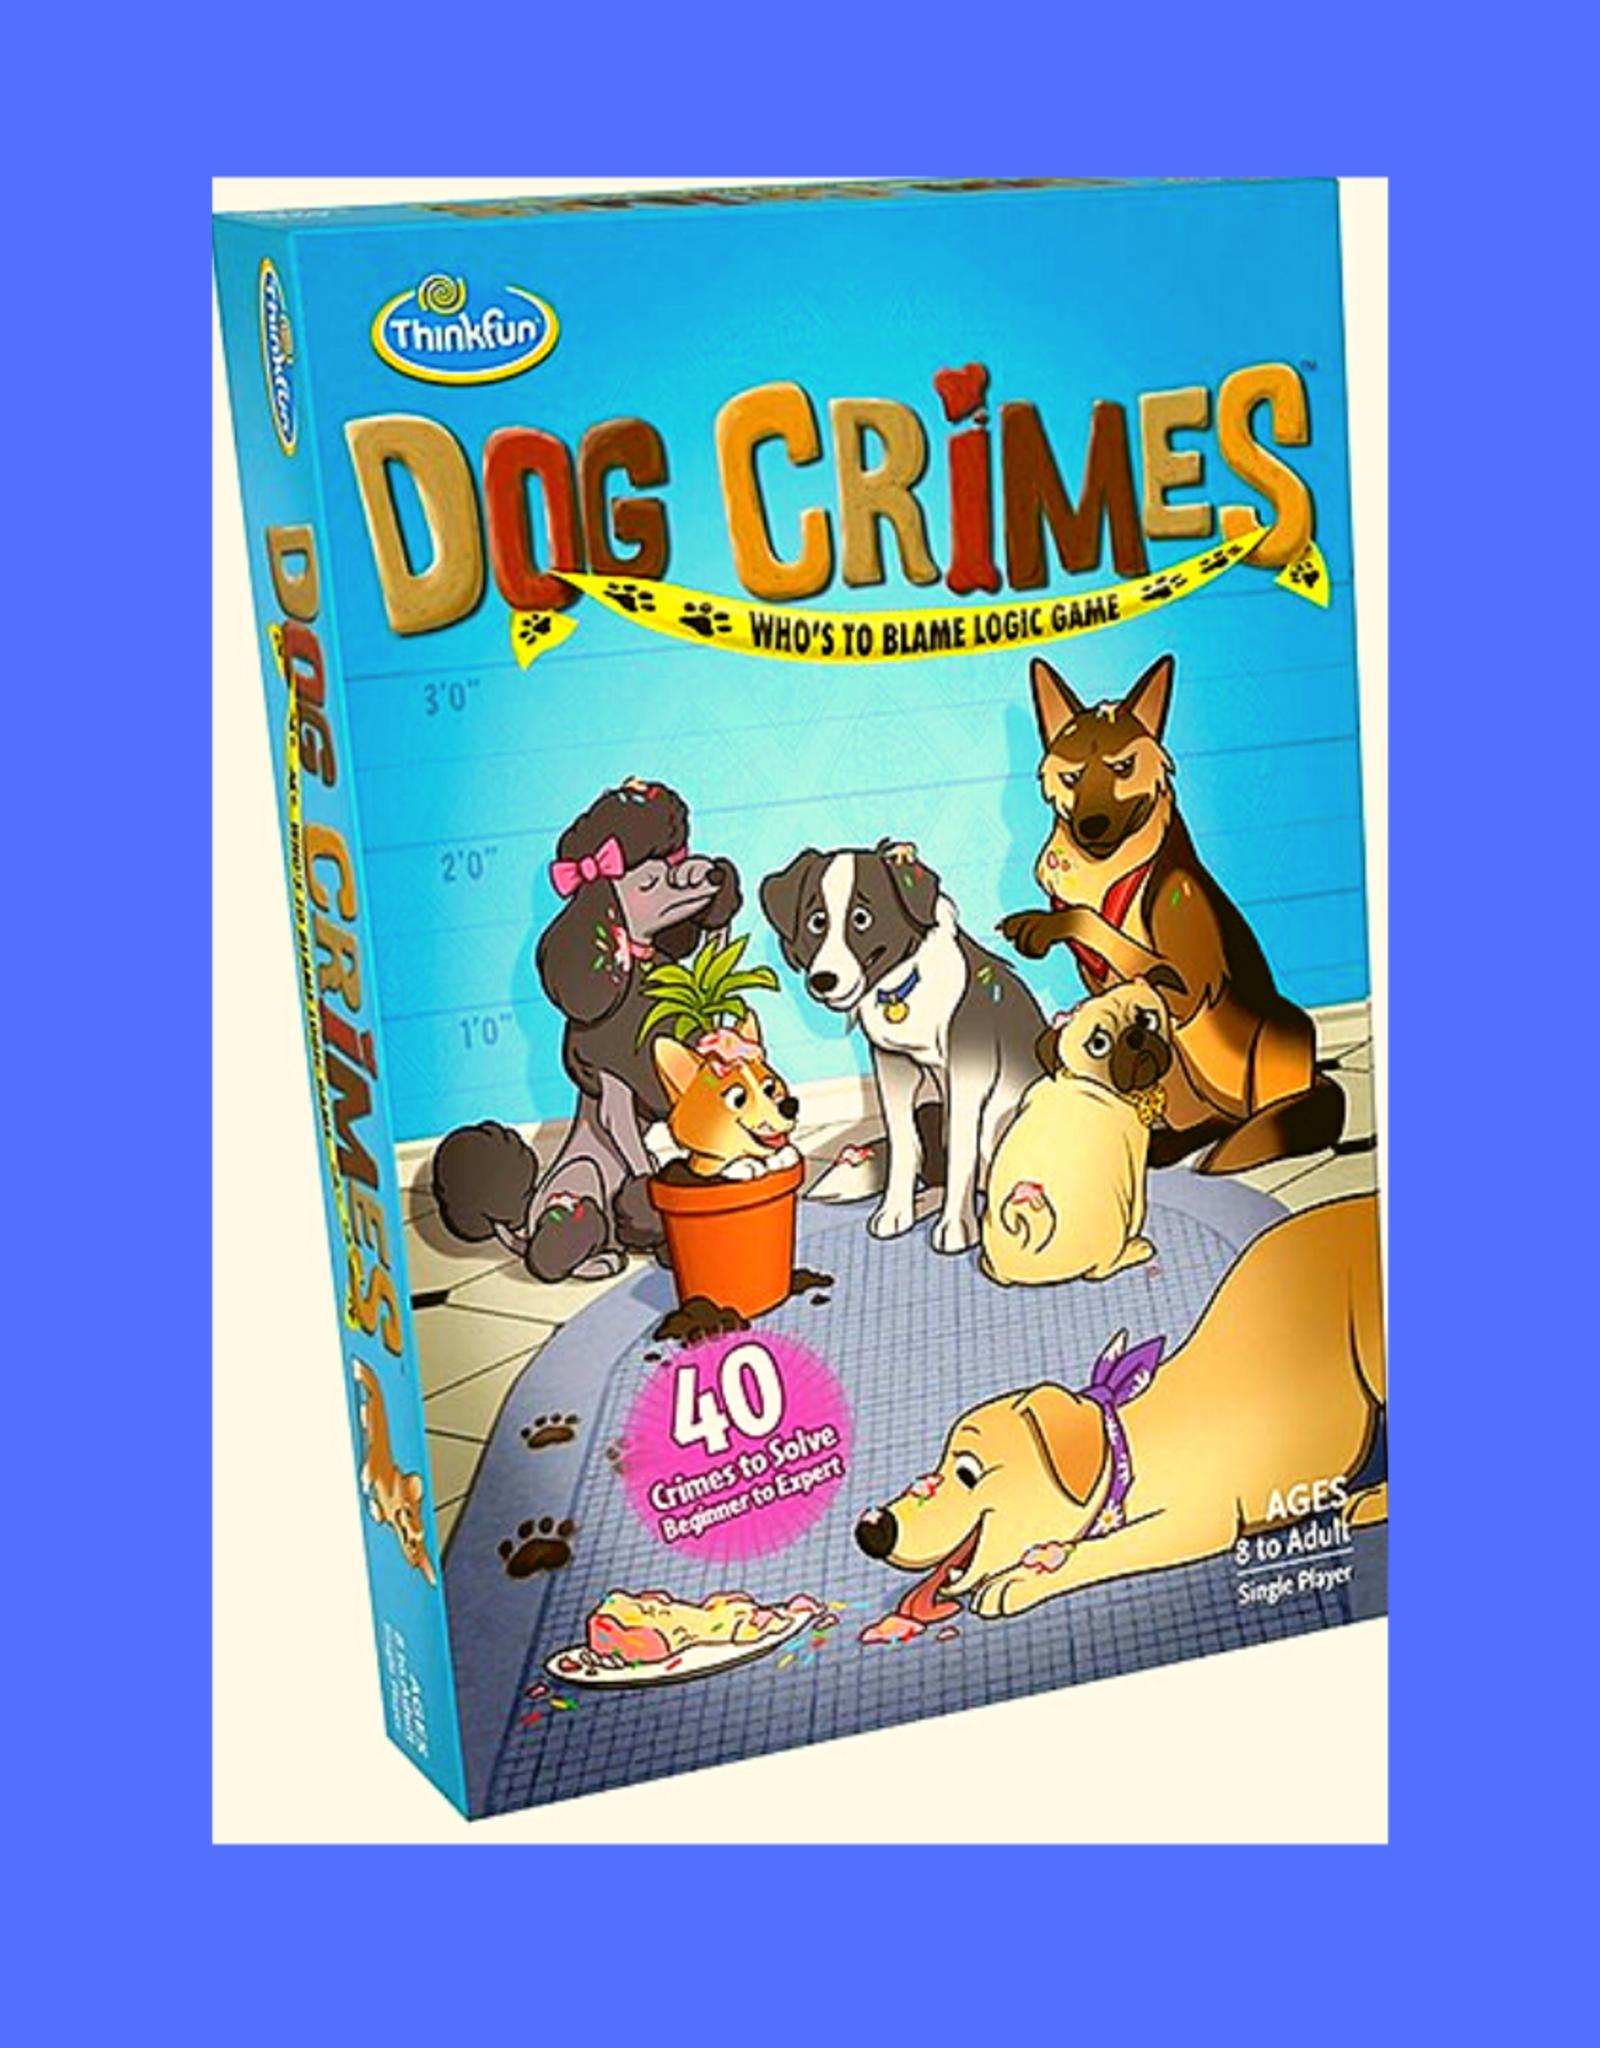 THINK FUN DOG CRIMES